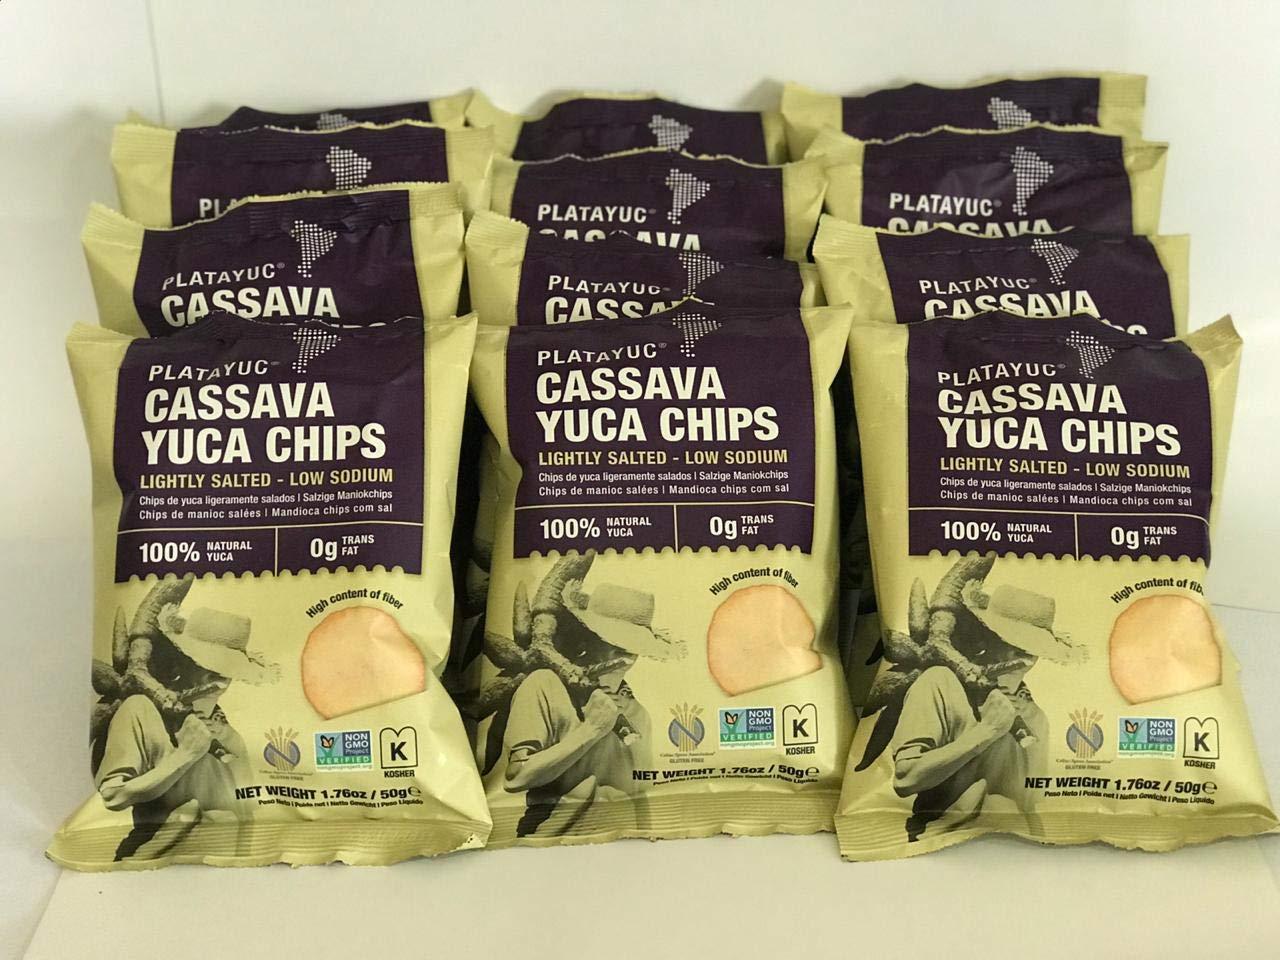 Platayuc Nature's Brand Yuca-Cassava chips lightly salted - Kosher - Gluten free - NON GMO - Vegan - 100% Natural - 0g Trans Fat - (Pack of 12) by Platayuc Nature's Brand